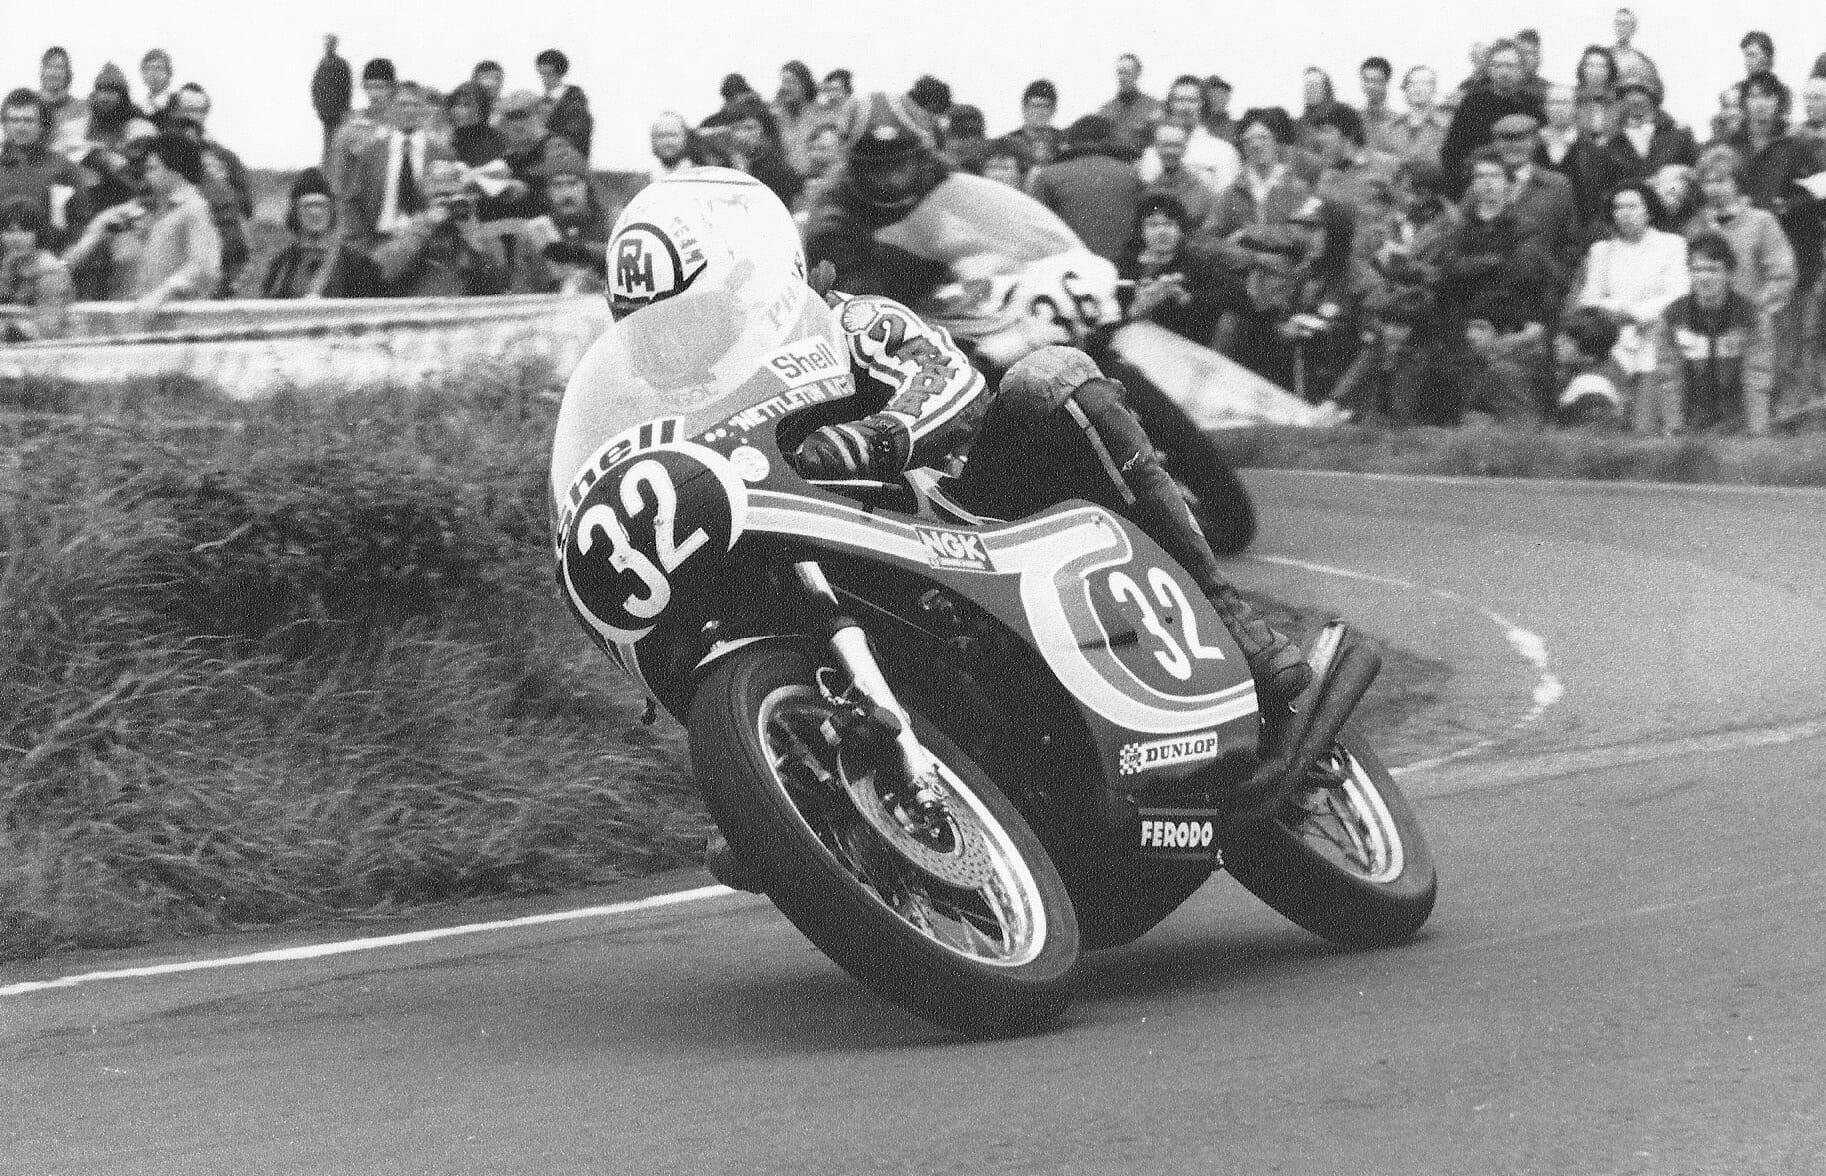 1979 80 Honda F3 400 4 Race Bike Ex Ron Haslam Anthony